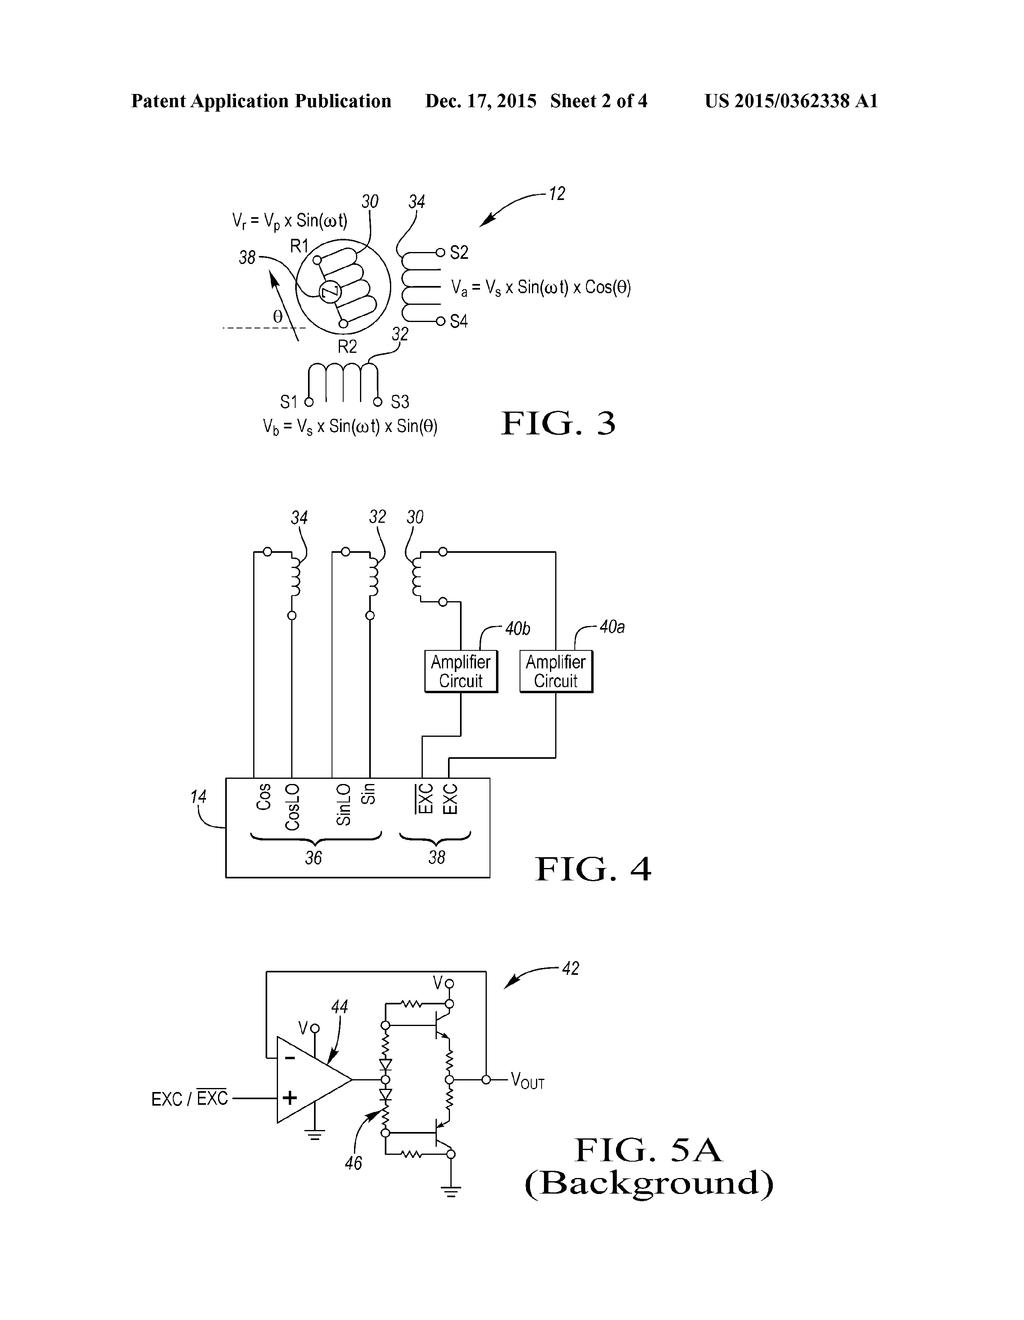 signal generator schematic wiring diagram database Ford Wiring Schematic excitation signal generator for resolver diagram schematic and portable generator wiring schematic excitation signal generator for